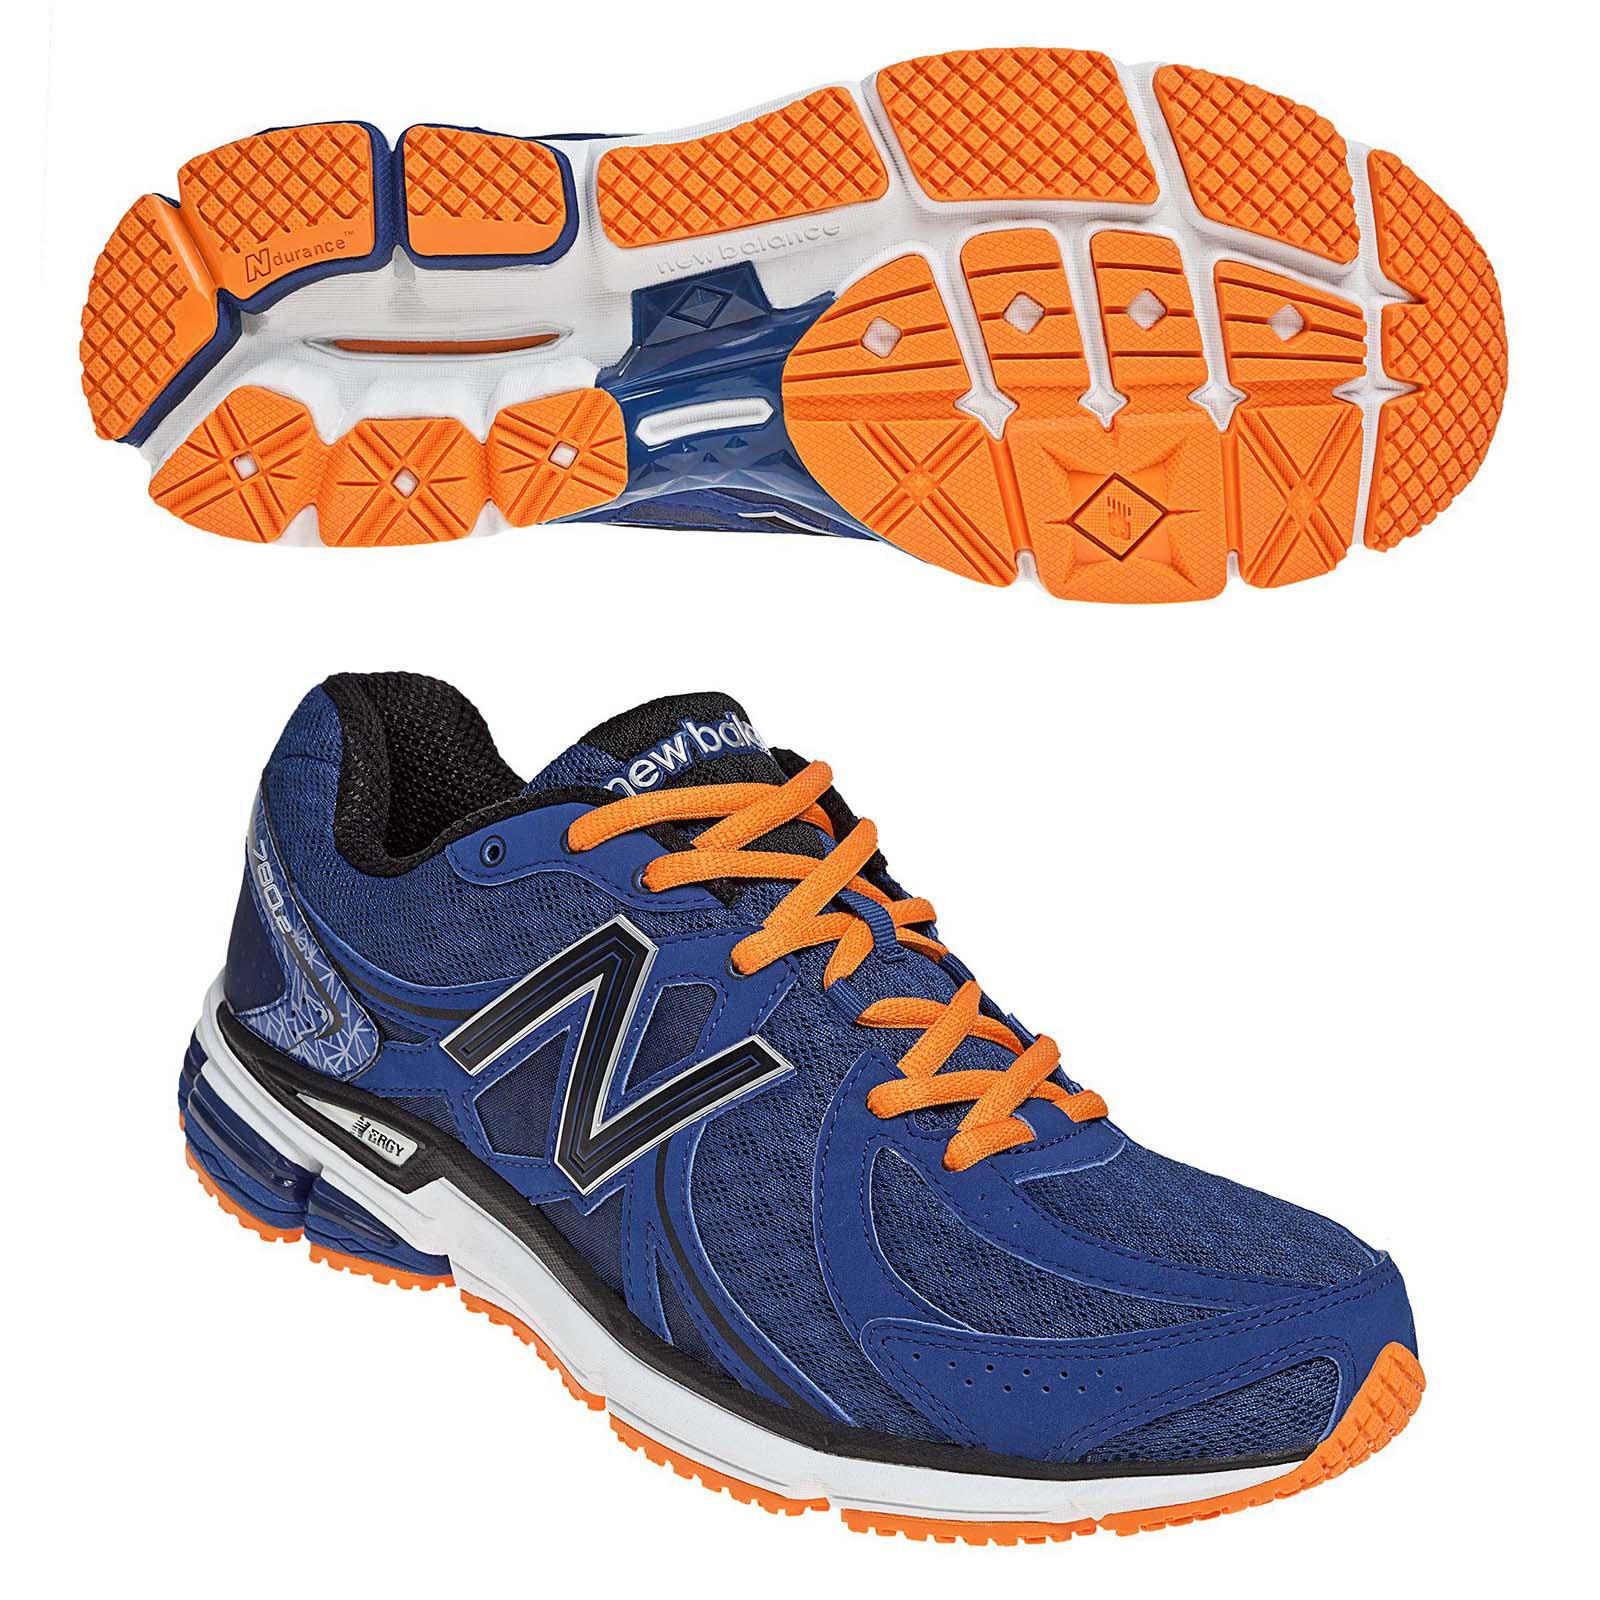 new_balance_m780v2_mens_running_shoes_new_balance_m780v2_mens_running